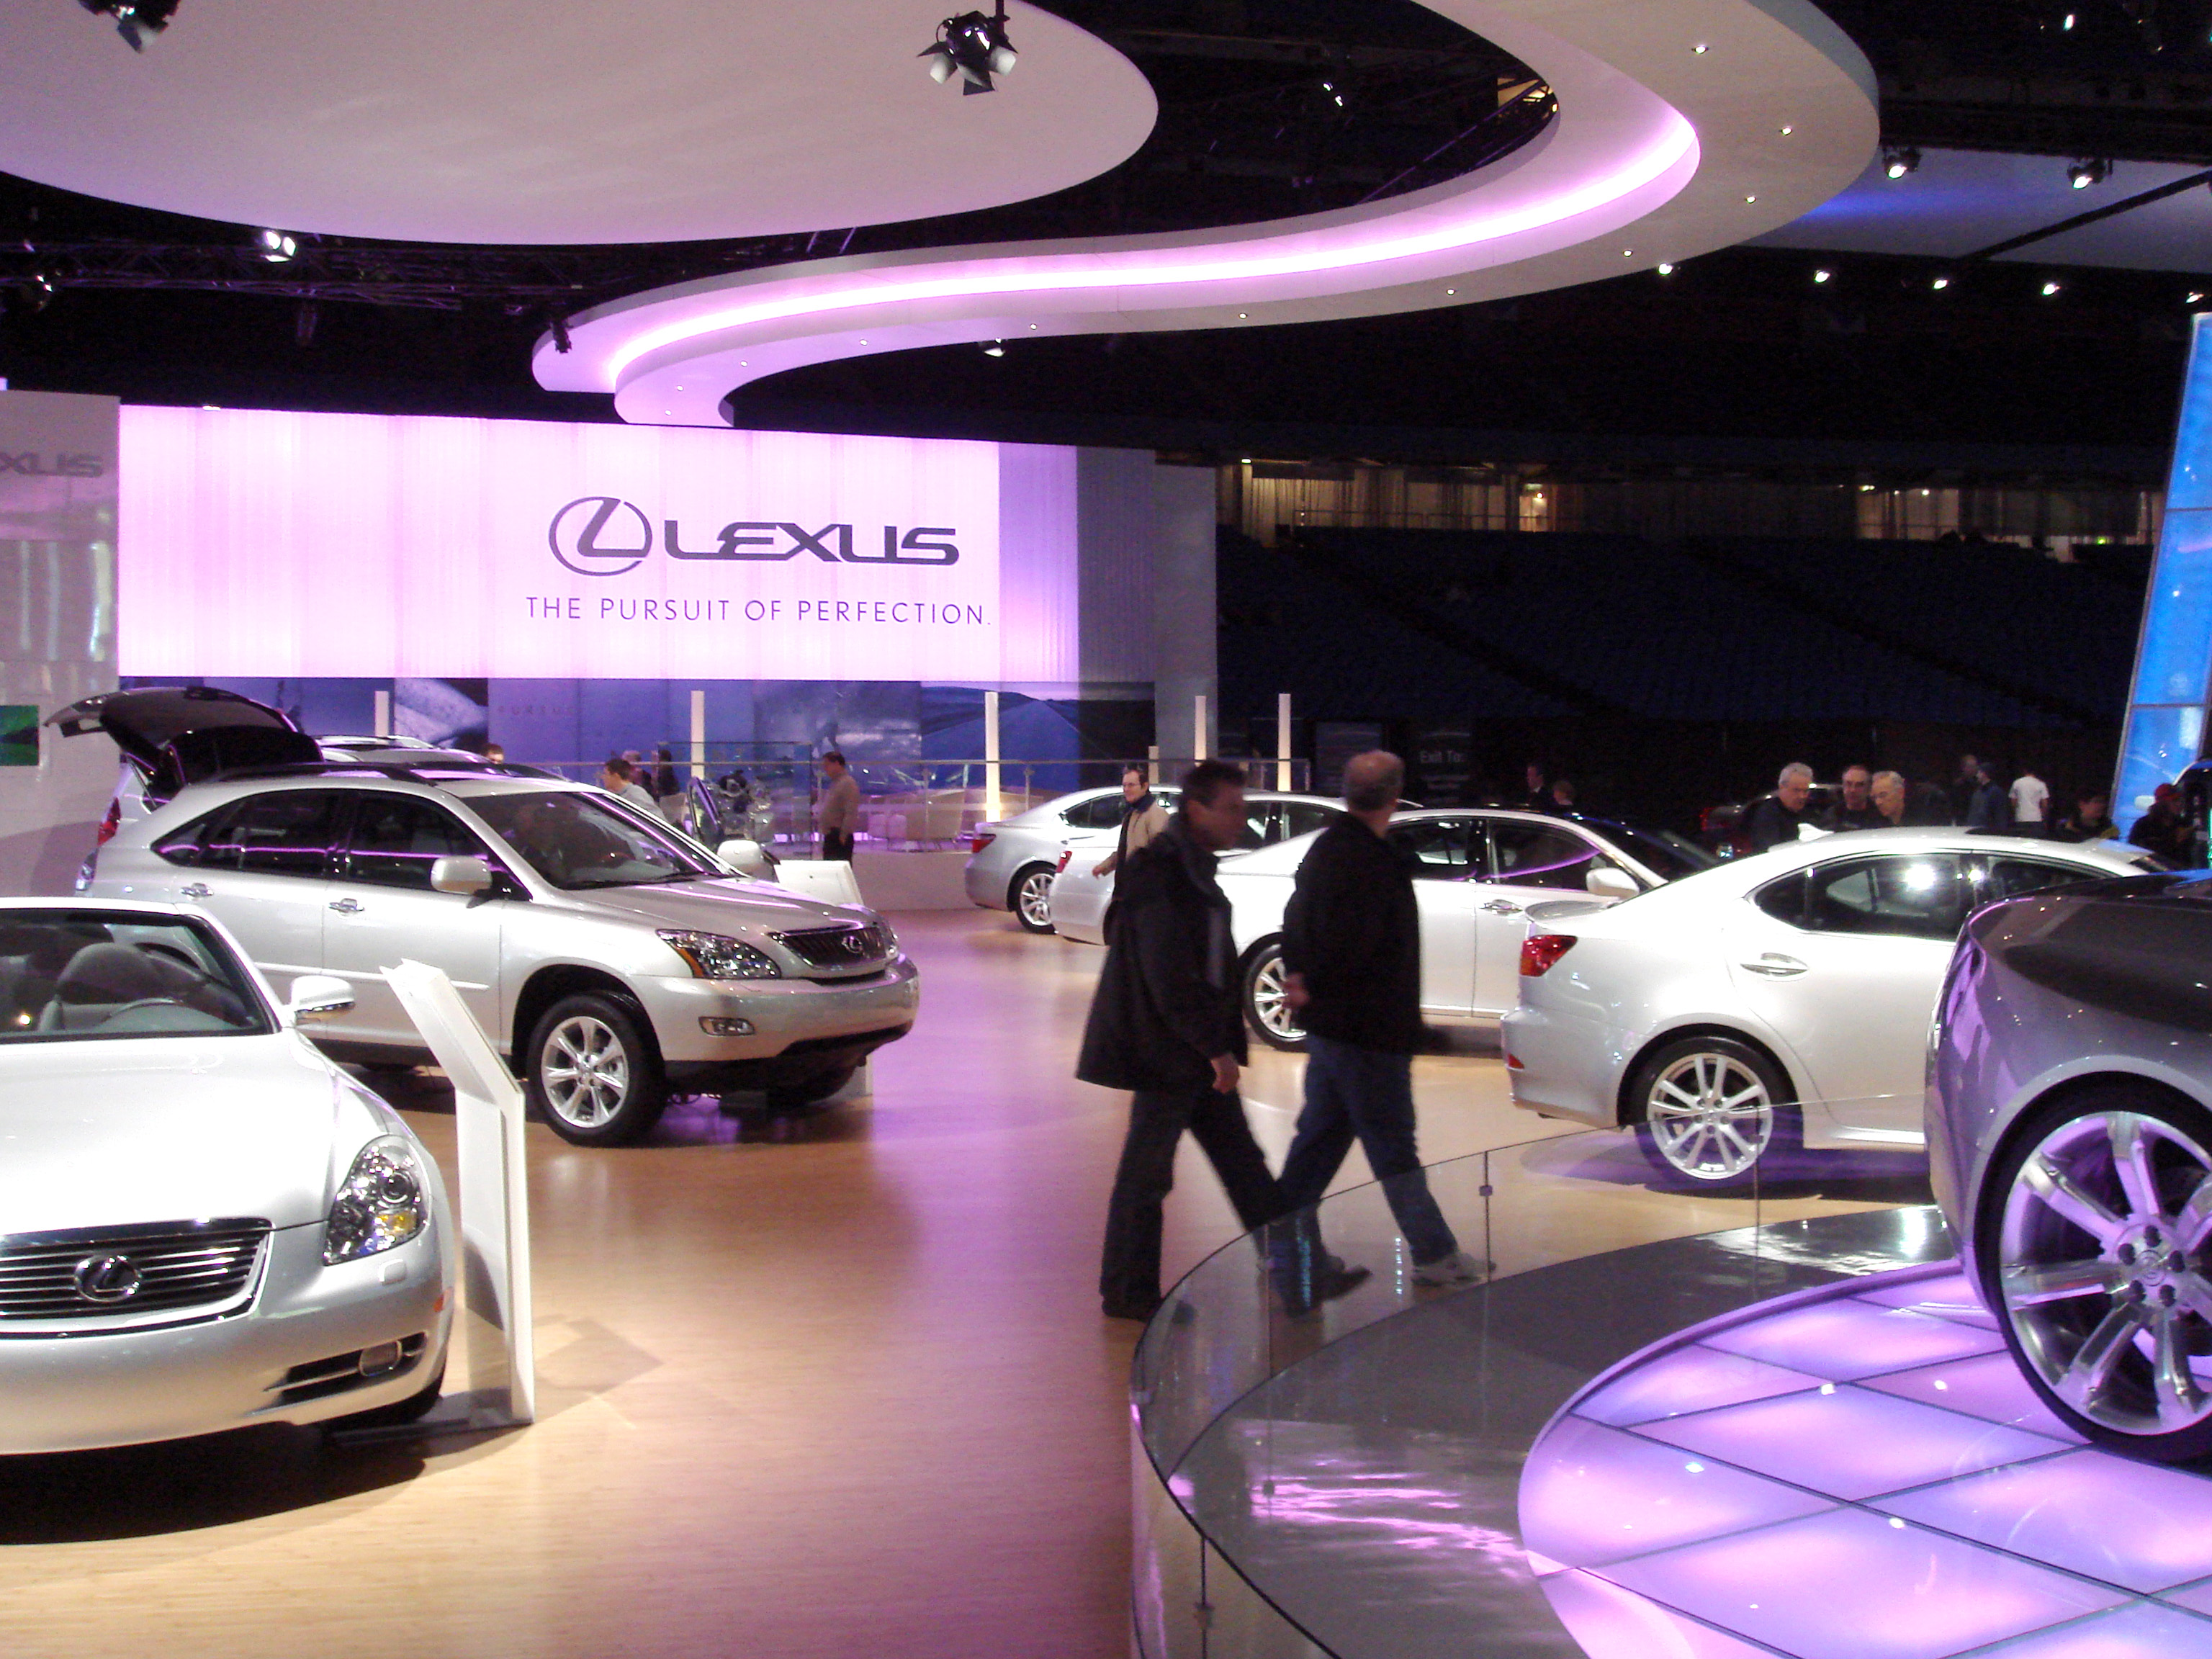 FileToronto Lexus Autoshow Displayjpg Wikimedia Commons - Lexus dealership toronto